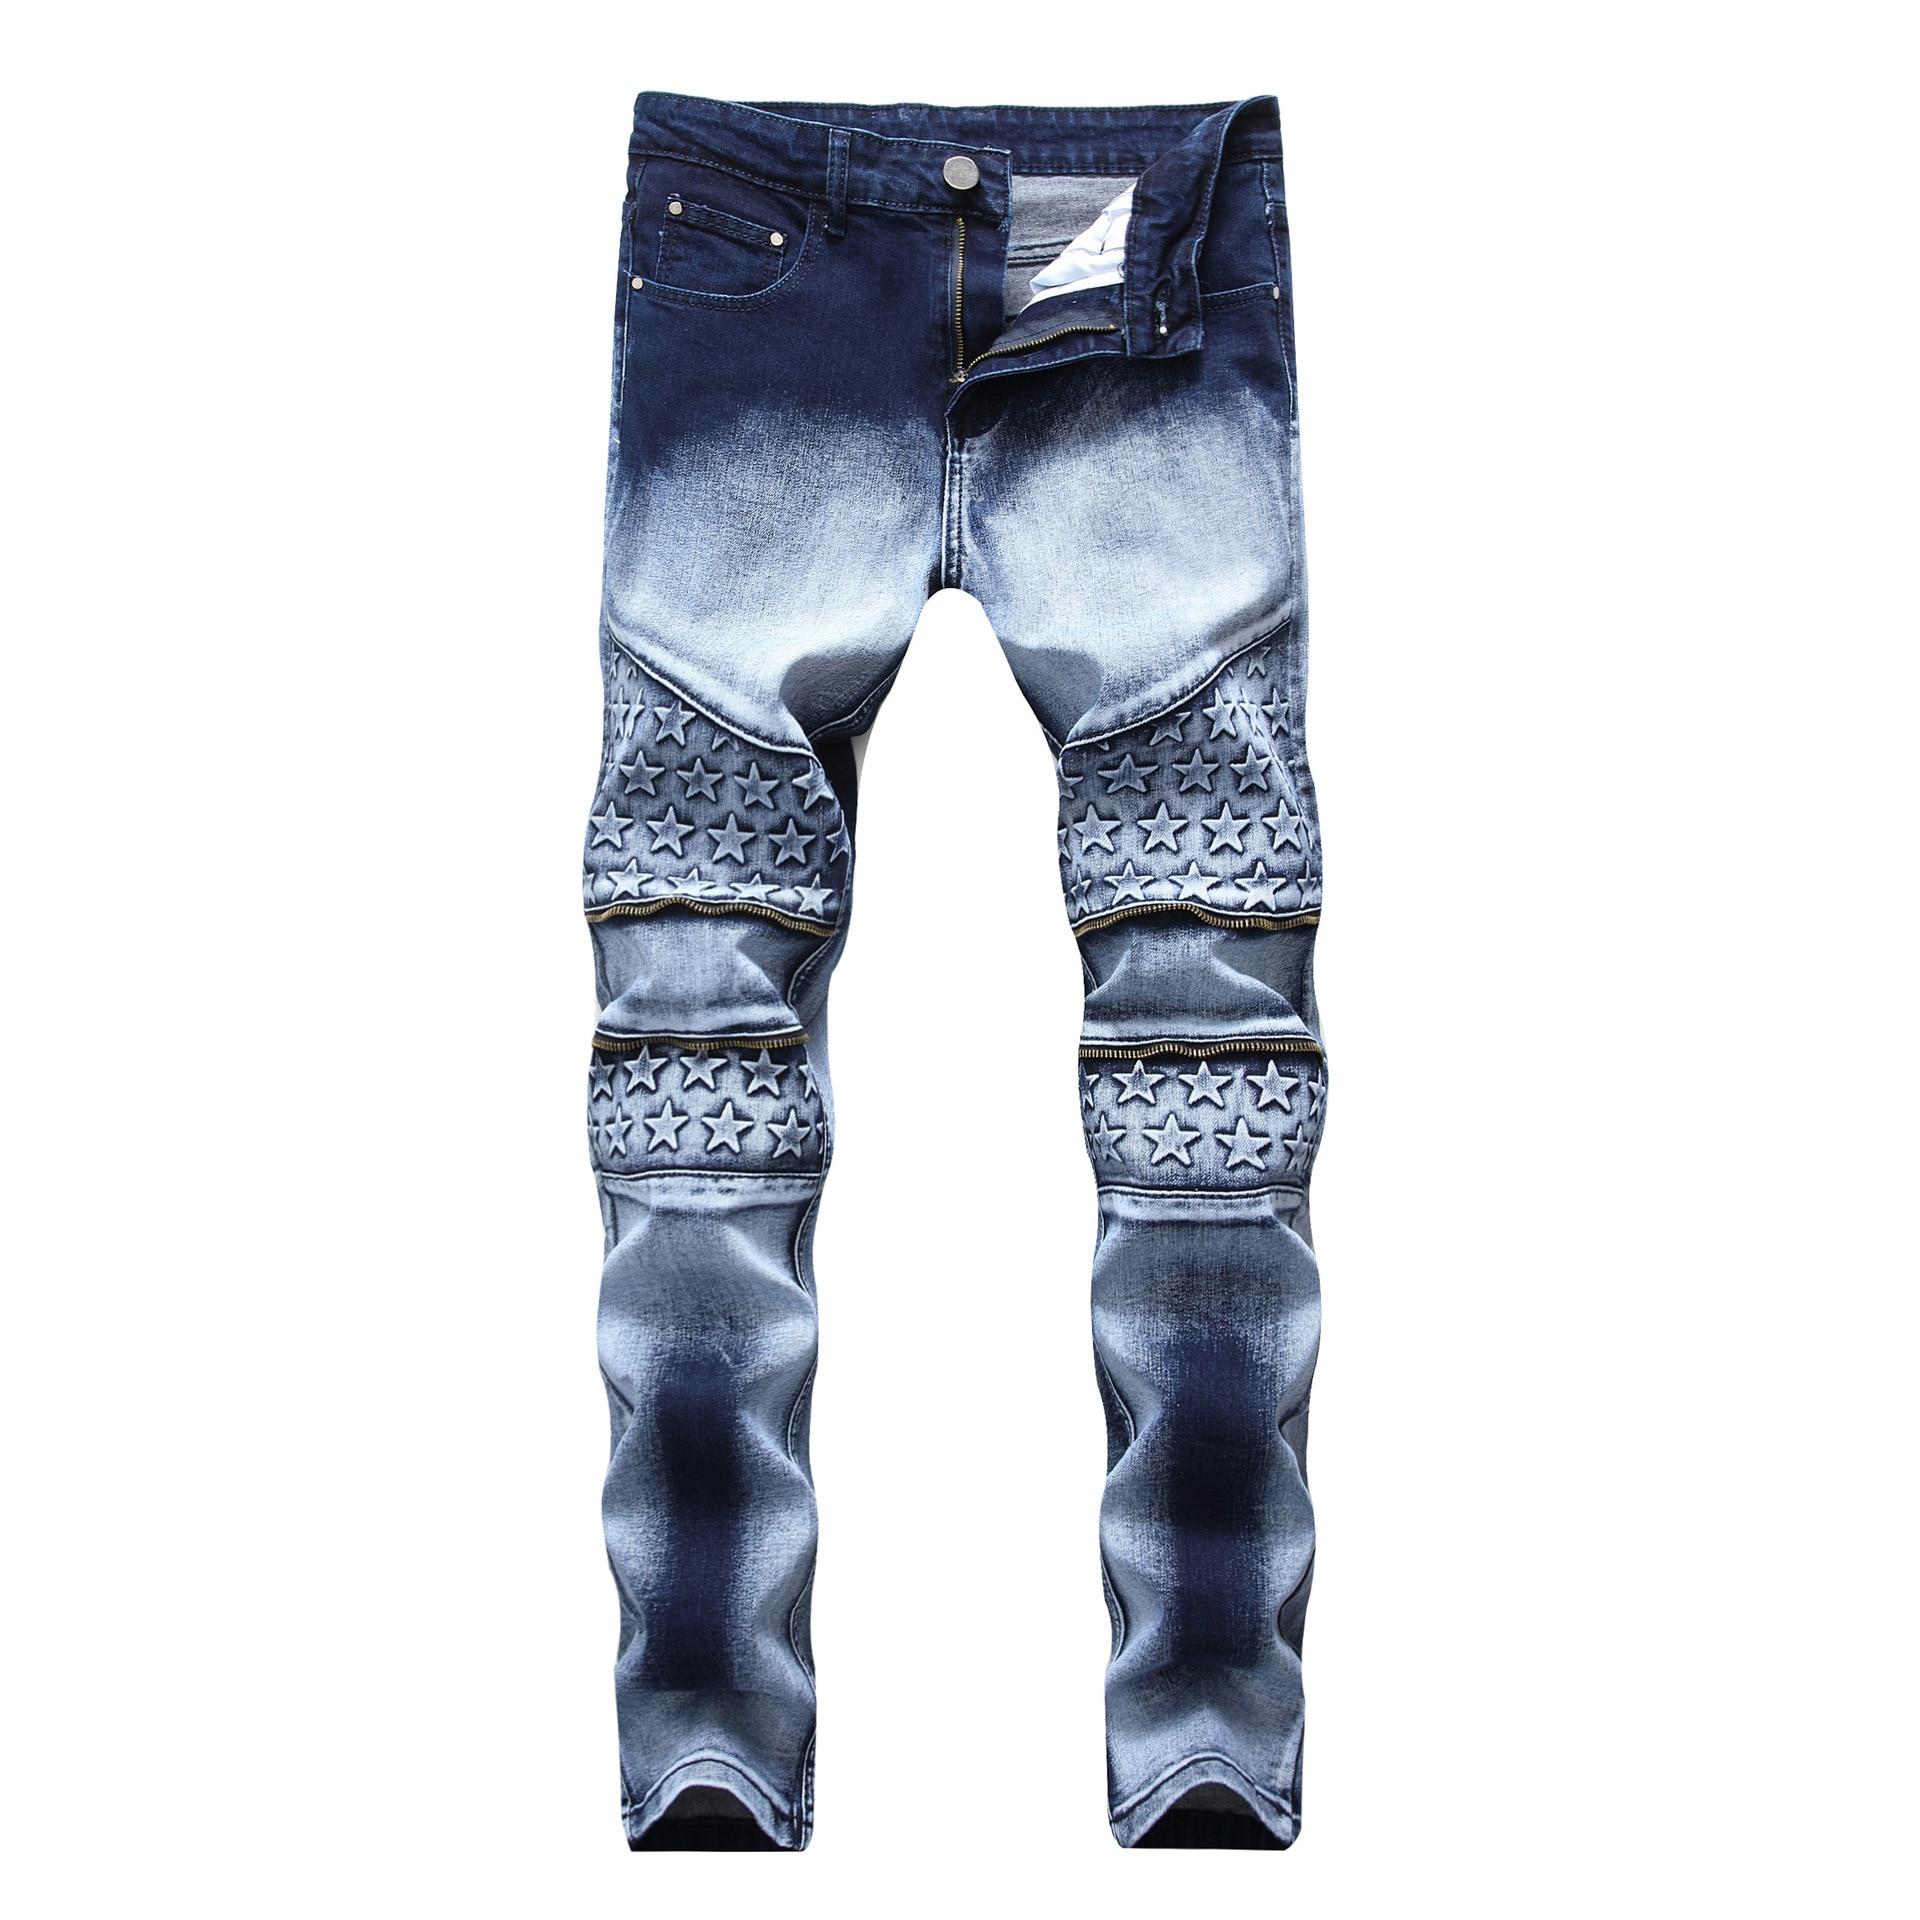 2018 jeans zipper stretch fashion double color mens slim straight jeans trousers